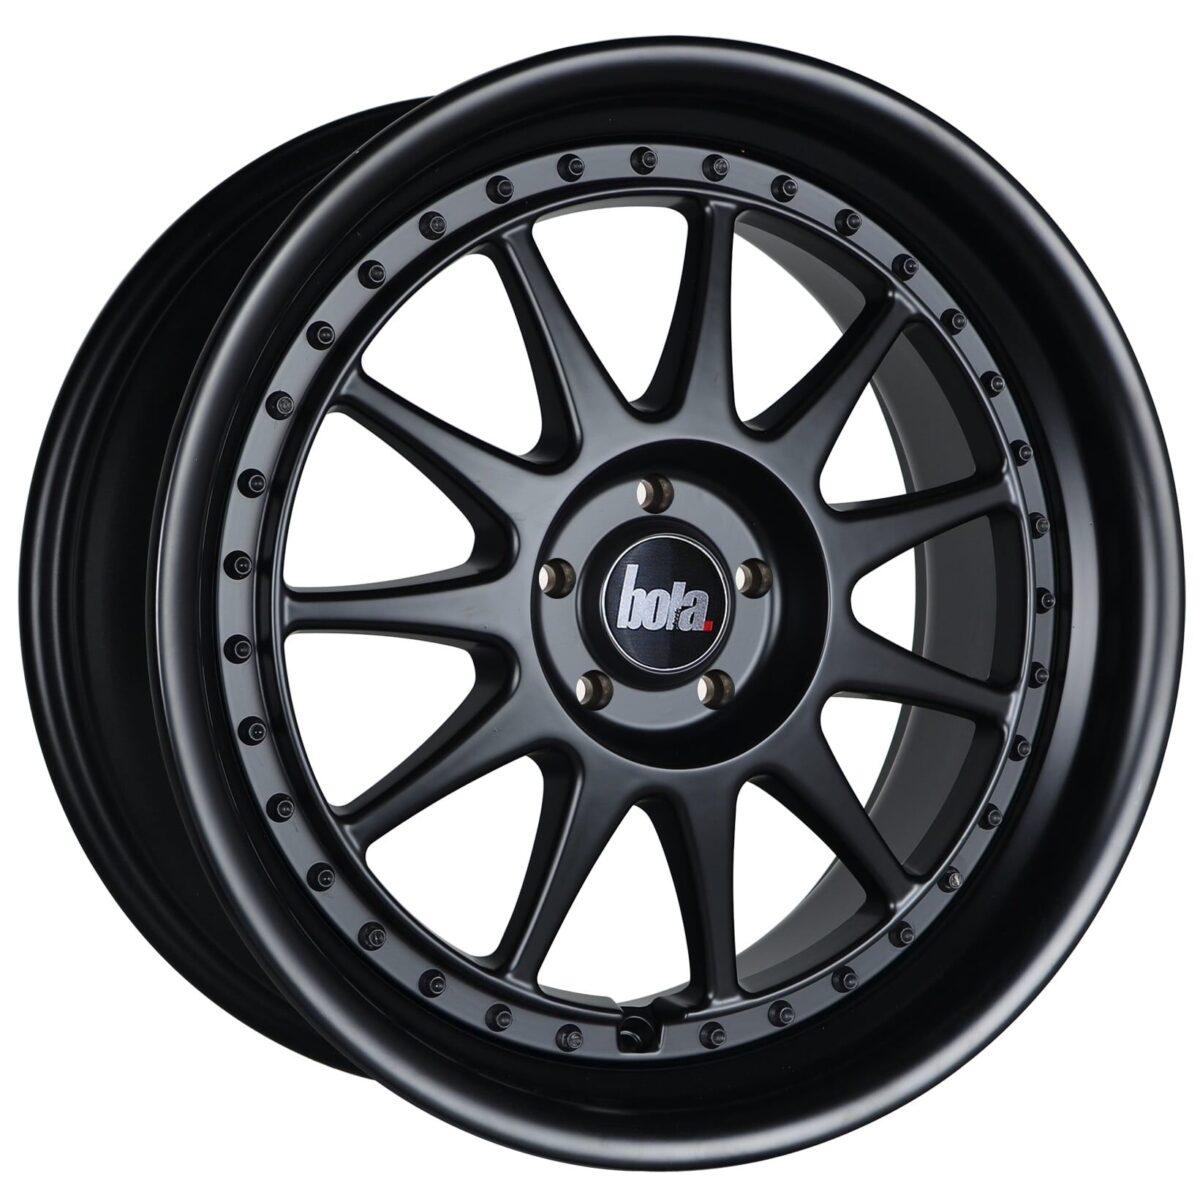 "18"" BOLA B4 Wheels - Matt Black with Black Rivets - All BMW Models"